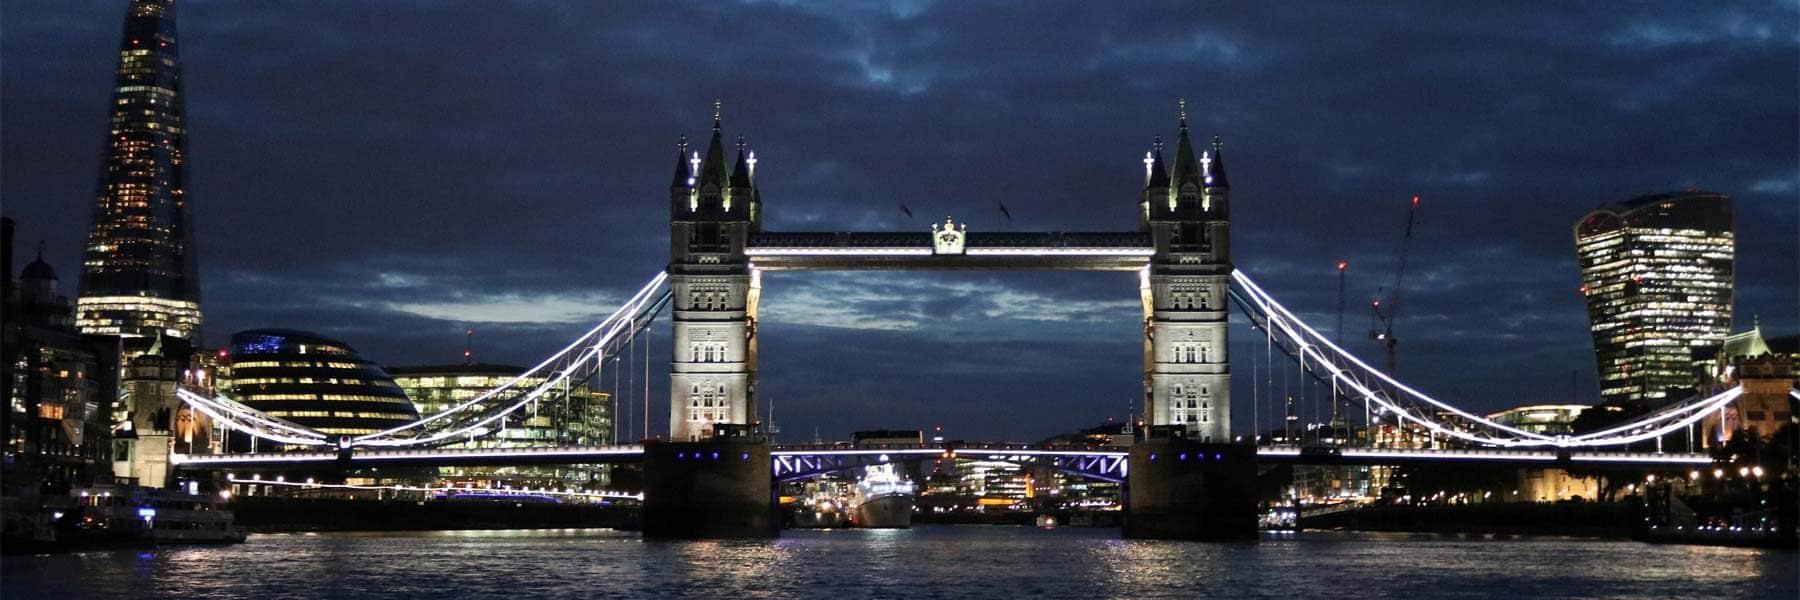 Tower Bridge & the Shard at night